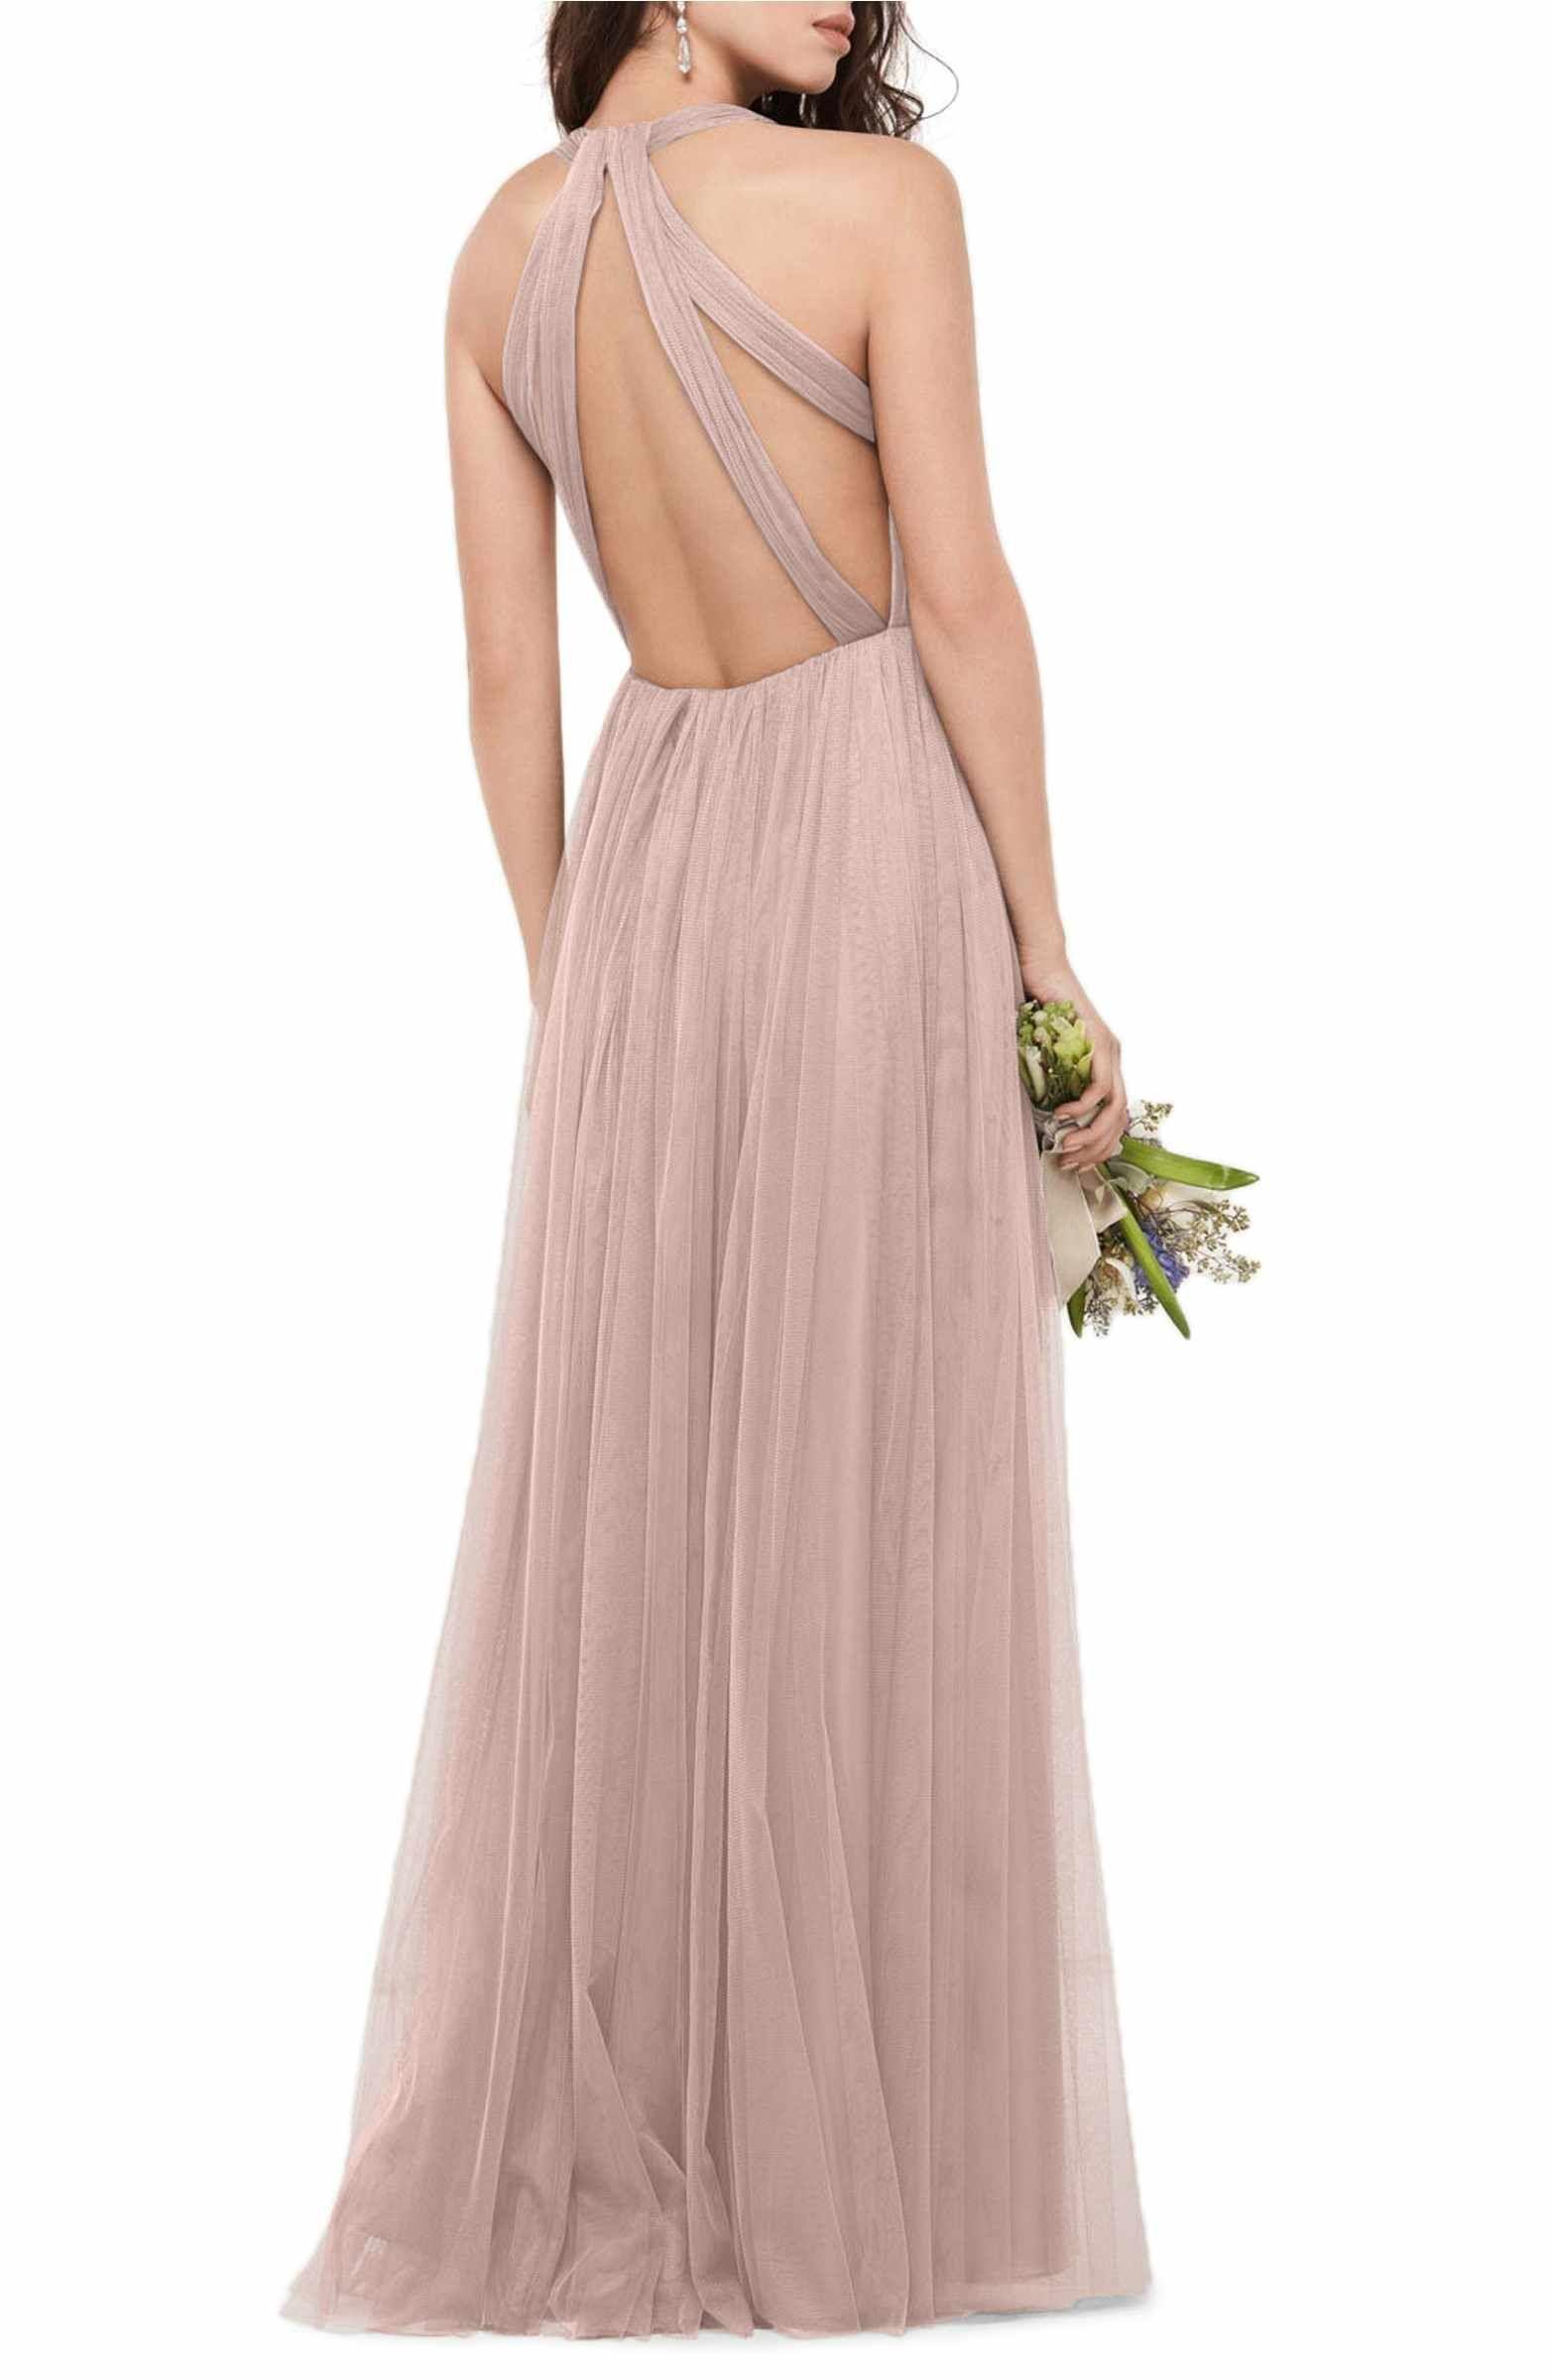 Main Image - WTOO Bobbinet Halter Gown | Wedding | Pinterest